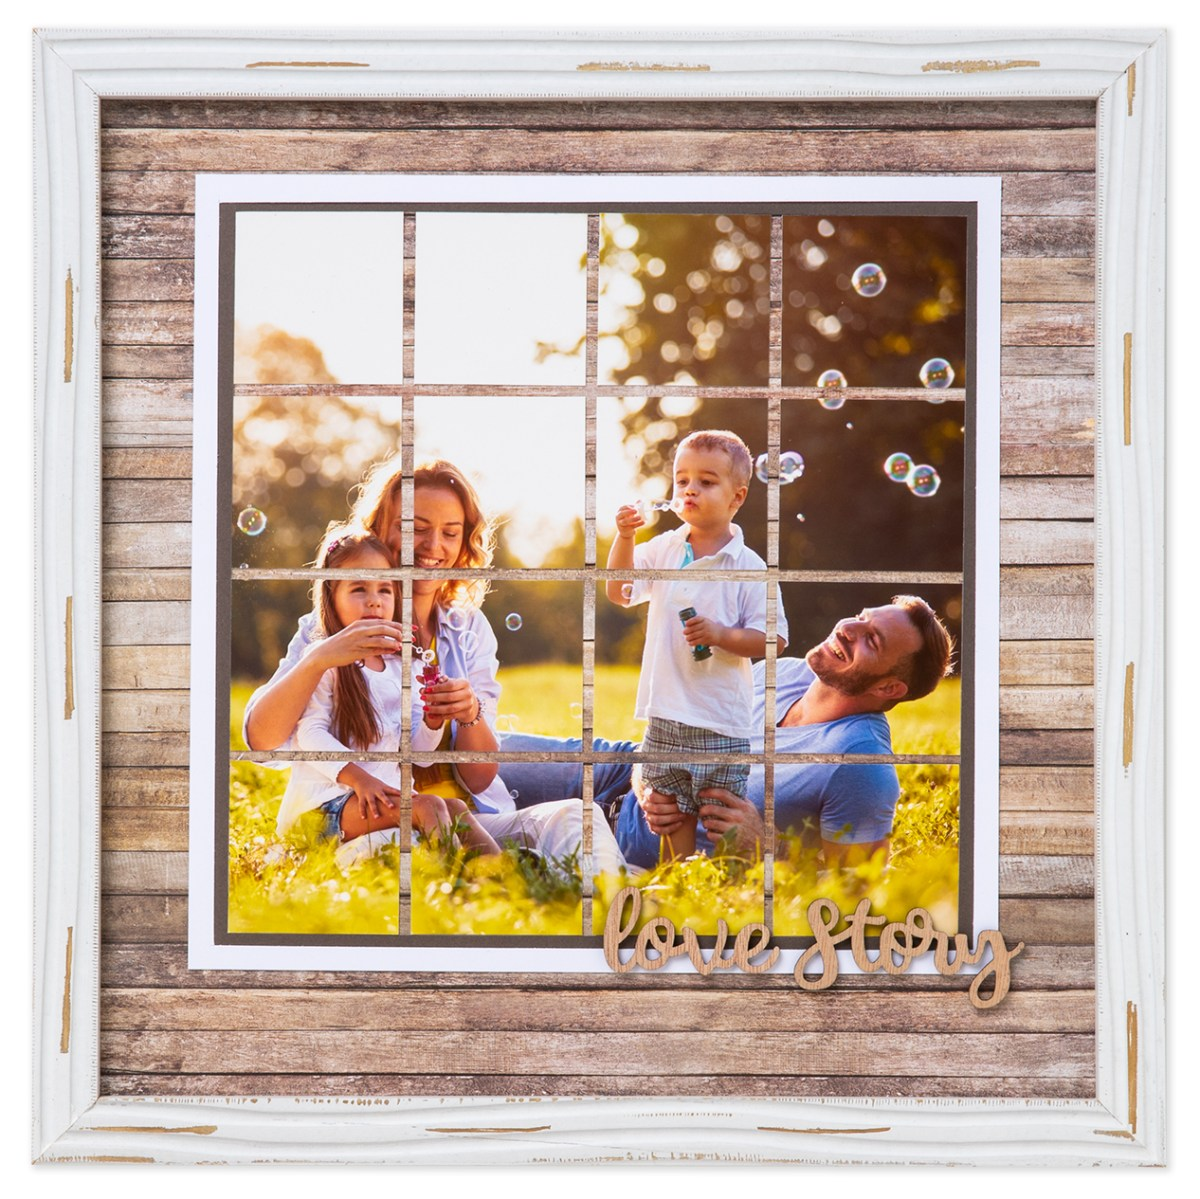 Photo Grids #ctmh #closetomyheart #photogrids #memorygrids #scrapbooking #memorykeeping #ctmhfreshair #ctmhdocumented